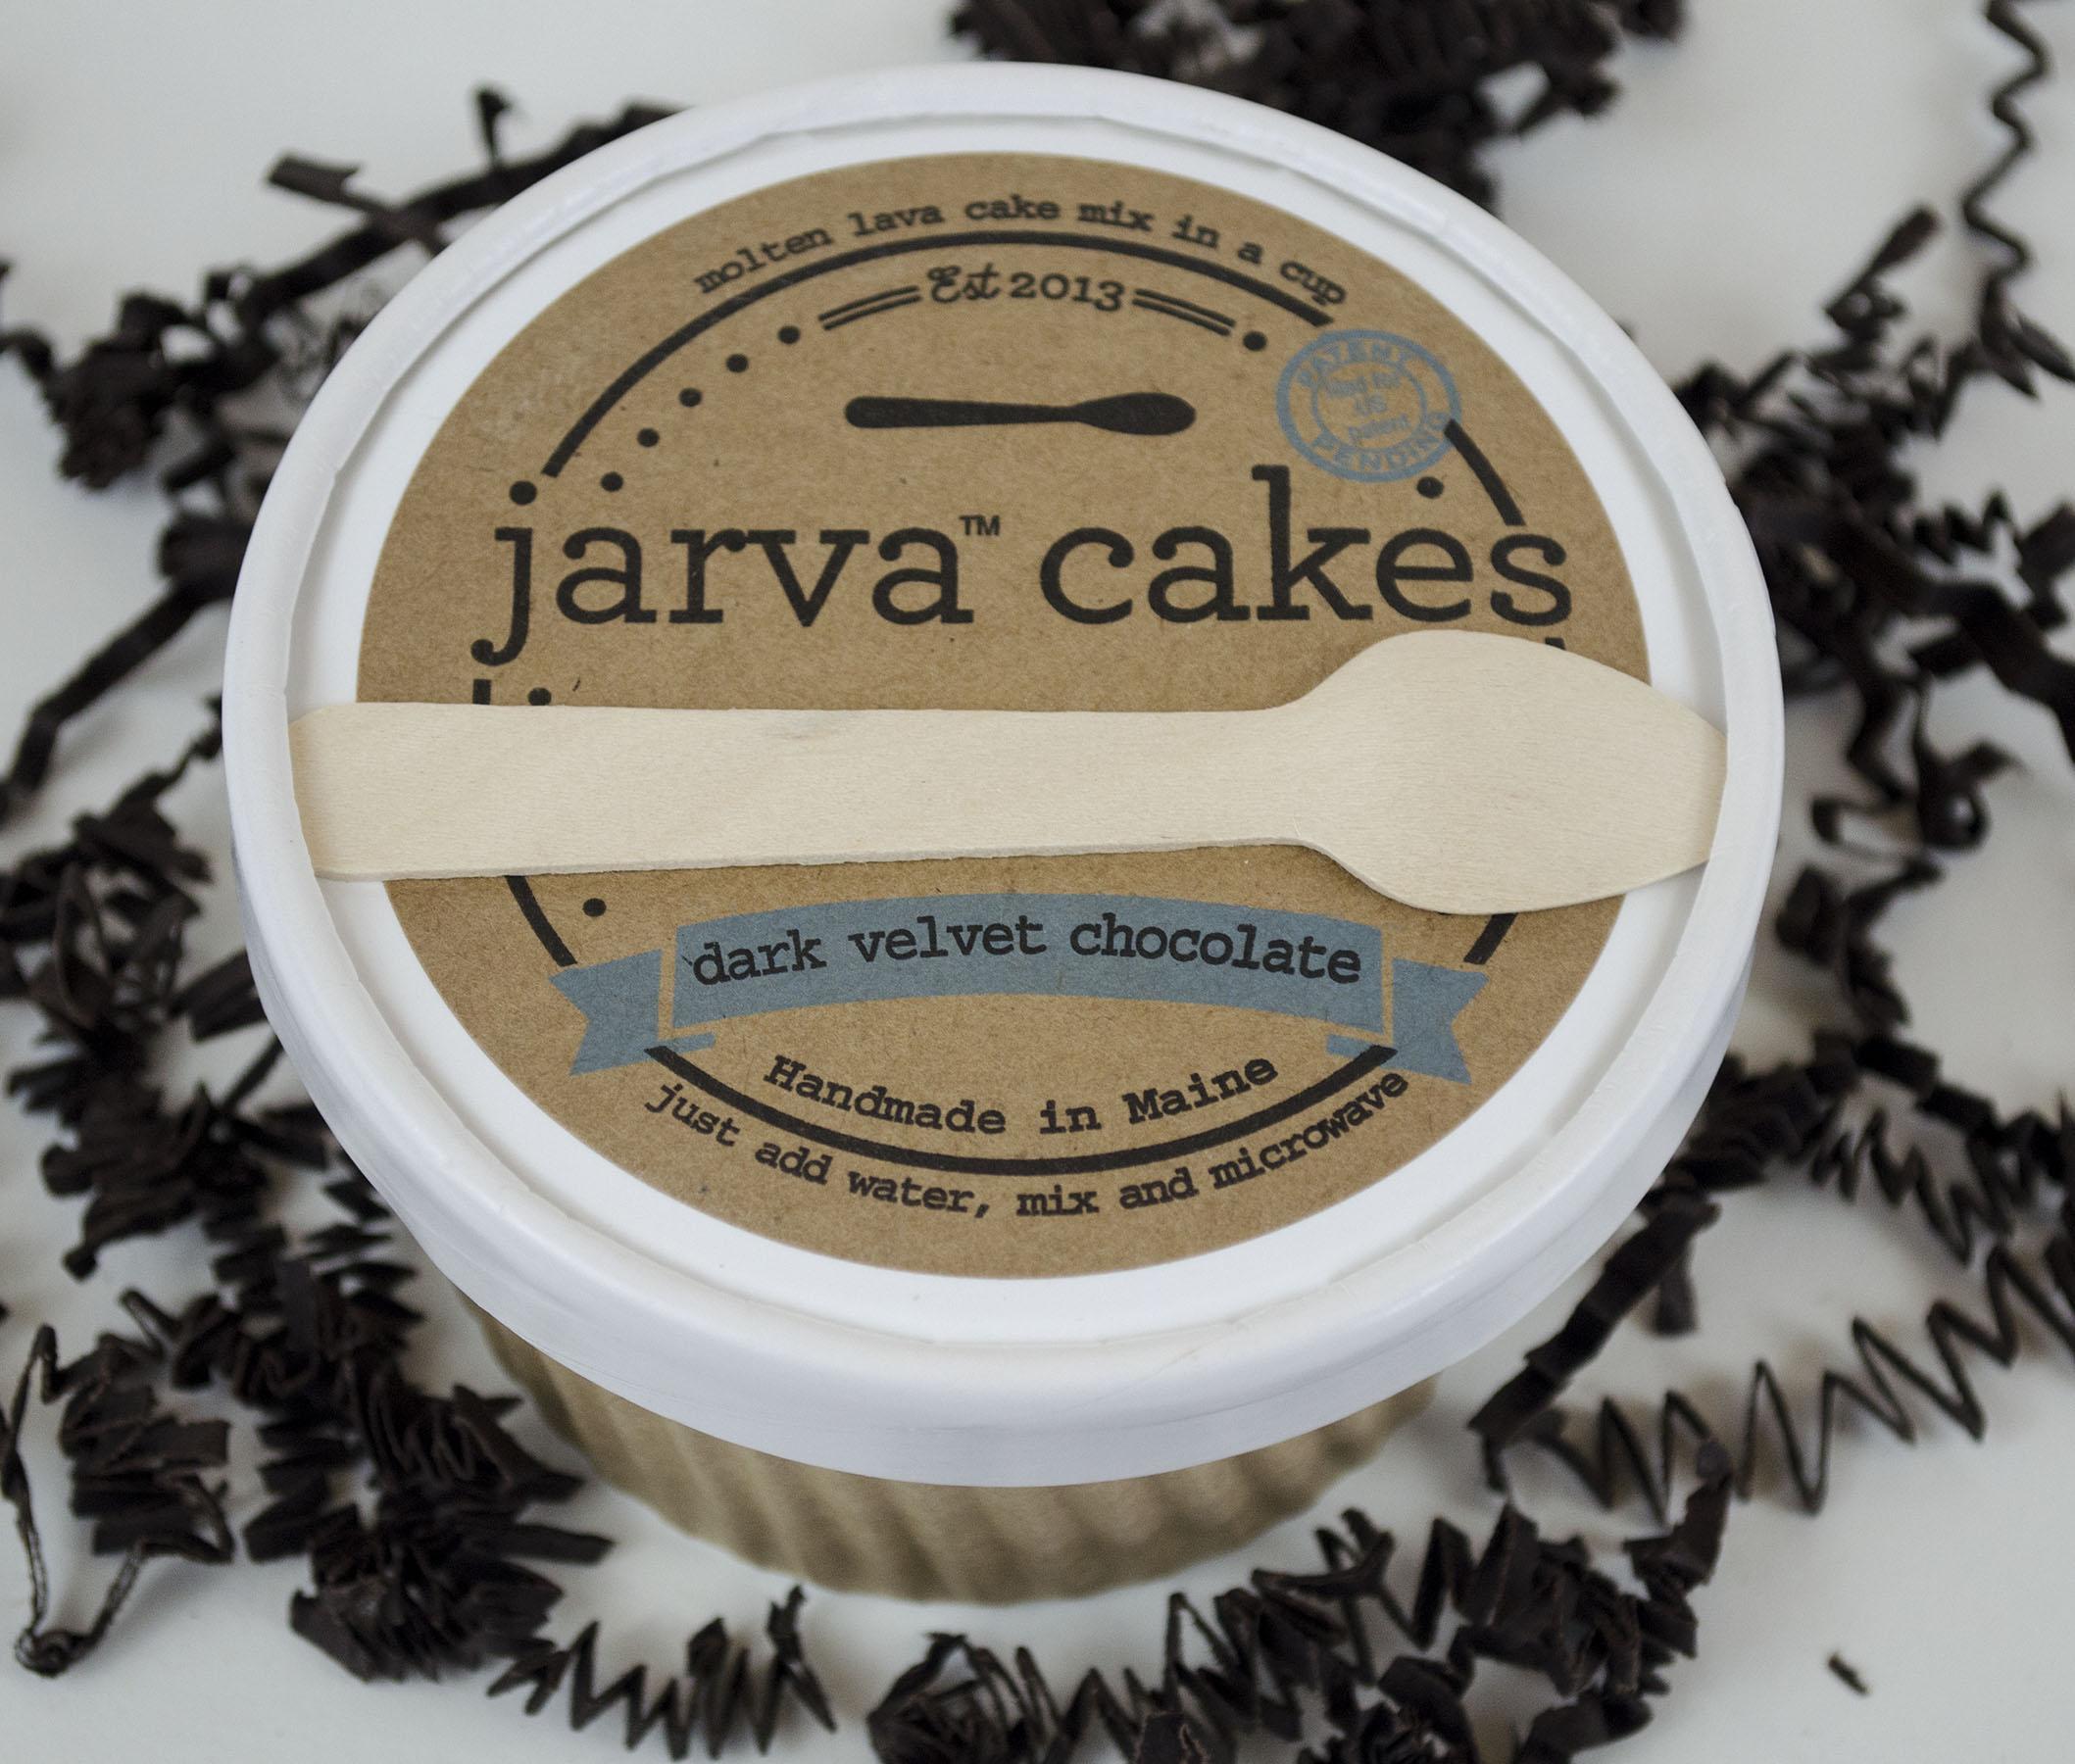 Dark Velvet Chocolate